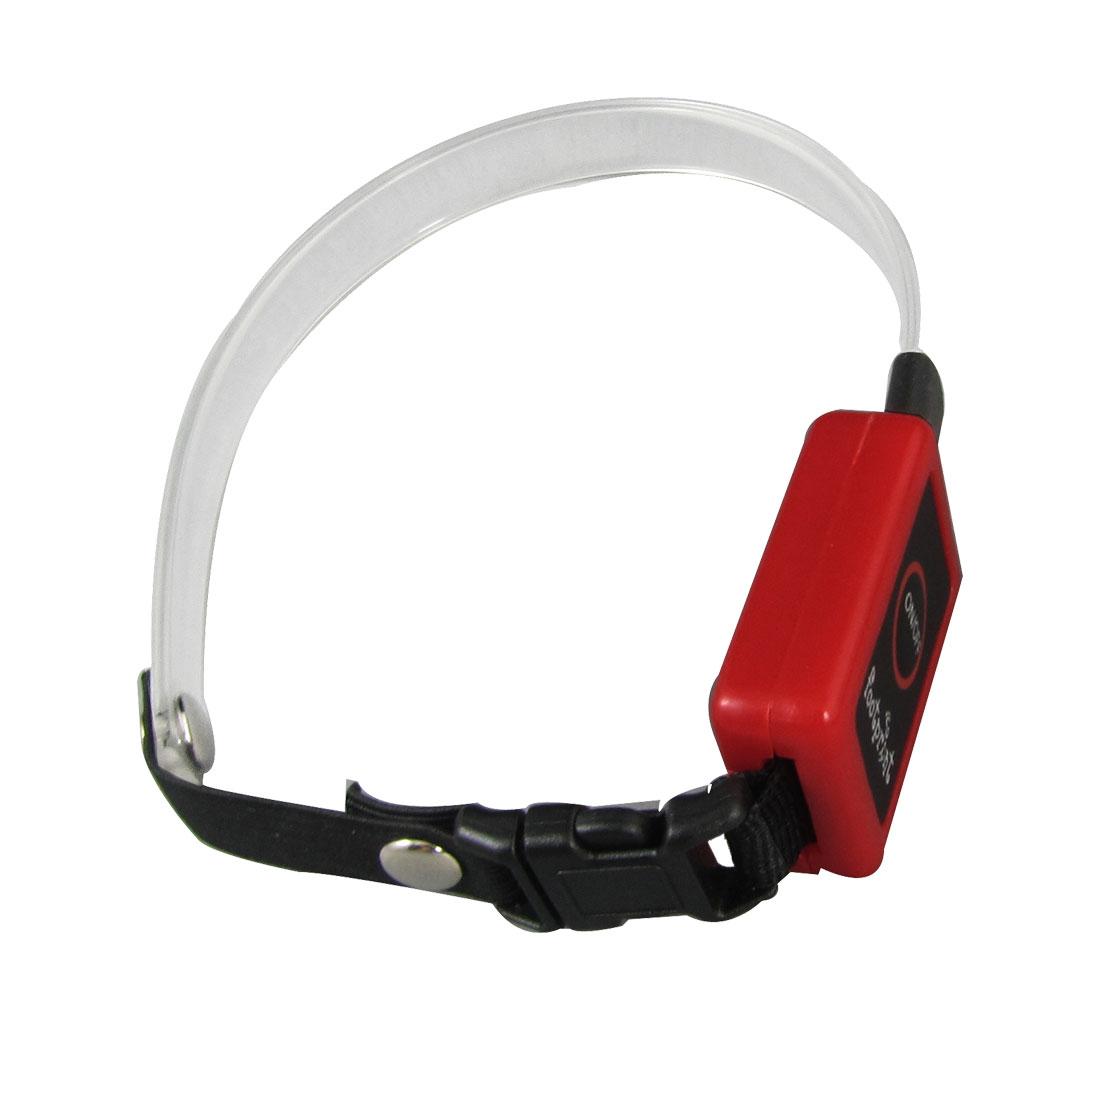 31cm Length Amazing Flashing Red LED Dog Pet ABS Safety Collar